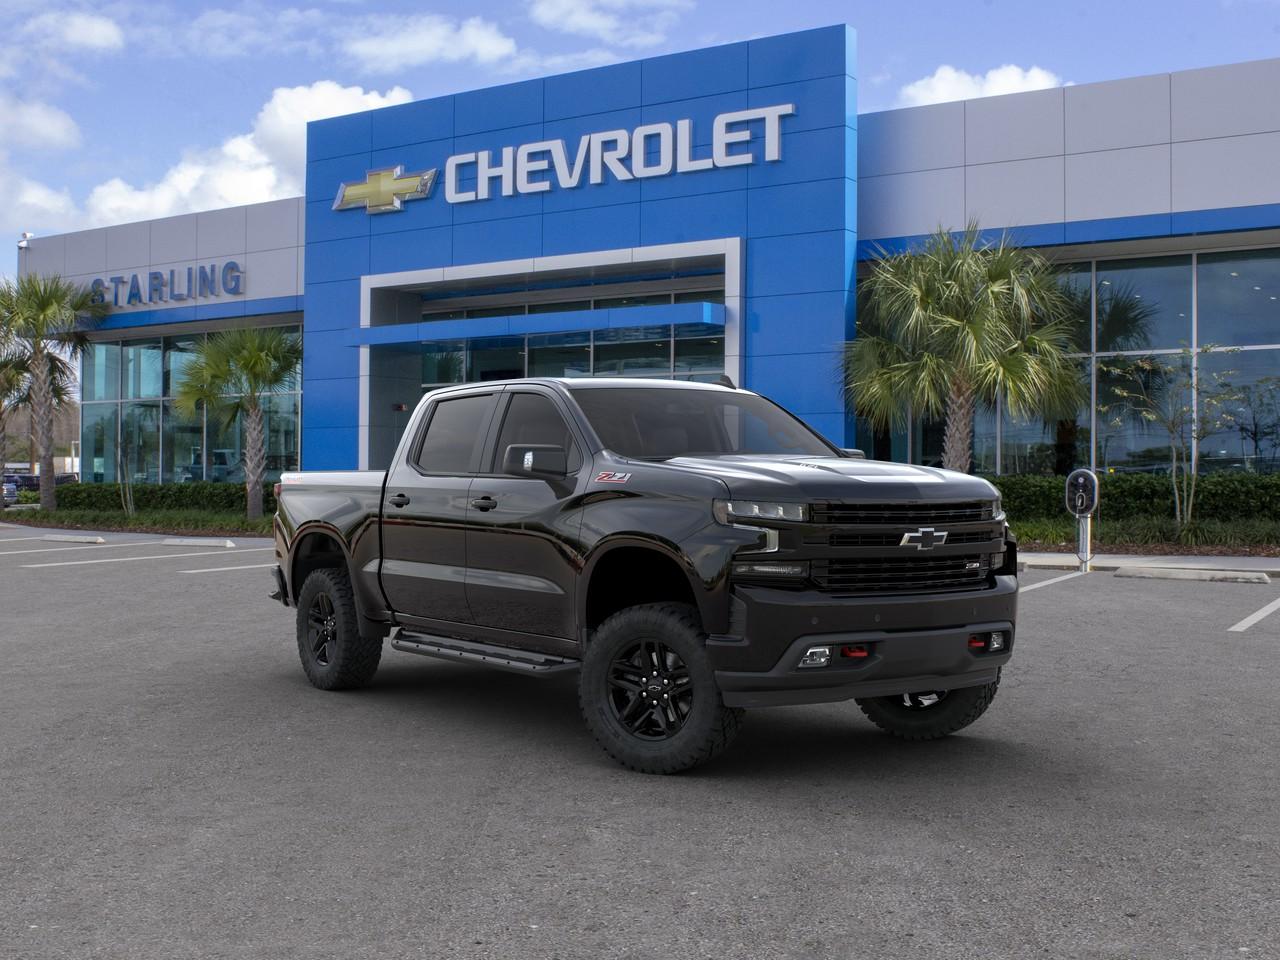 New 2020 Chevrolet Silverado 1500 LT Trail Boss